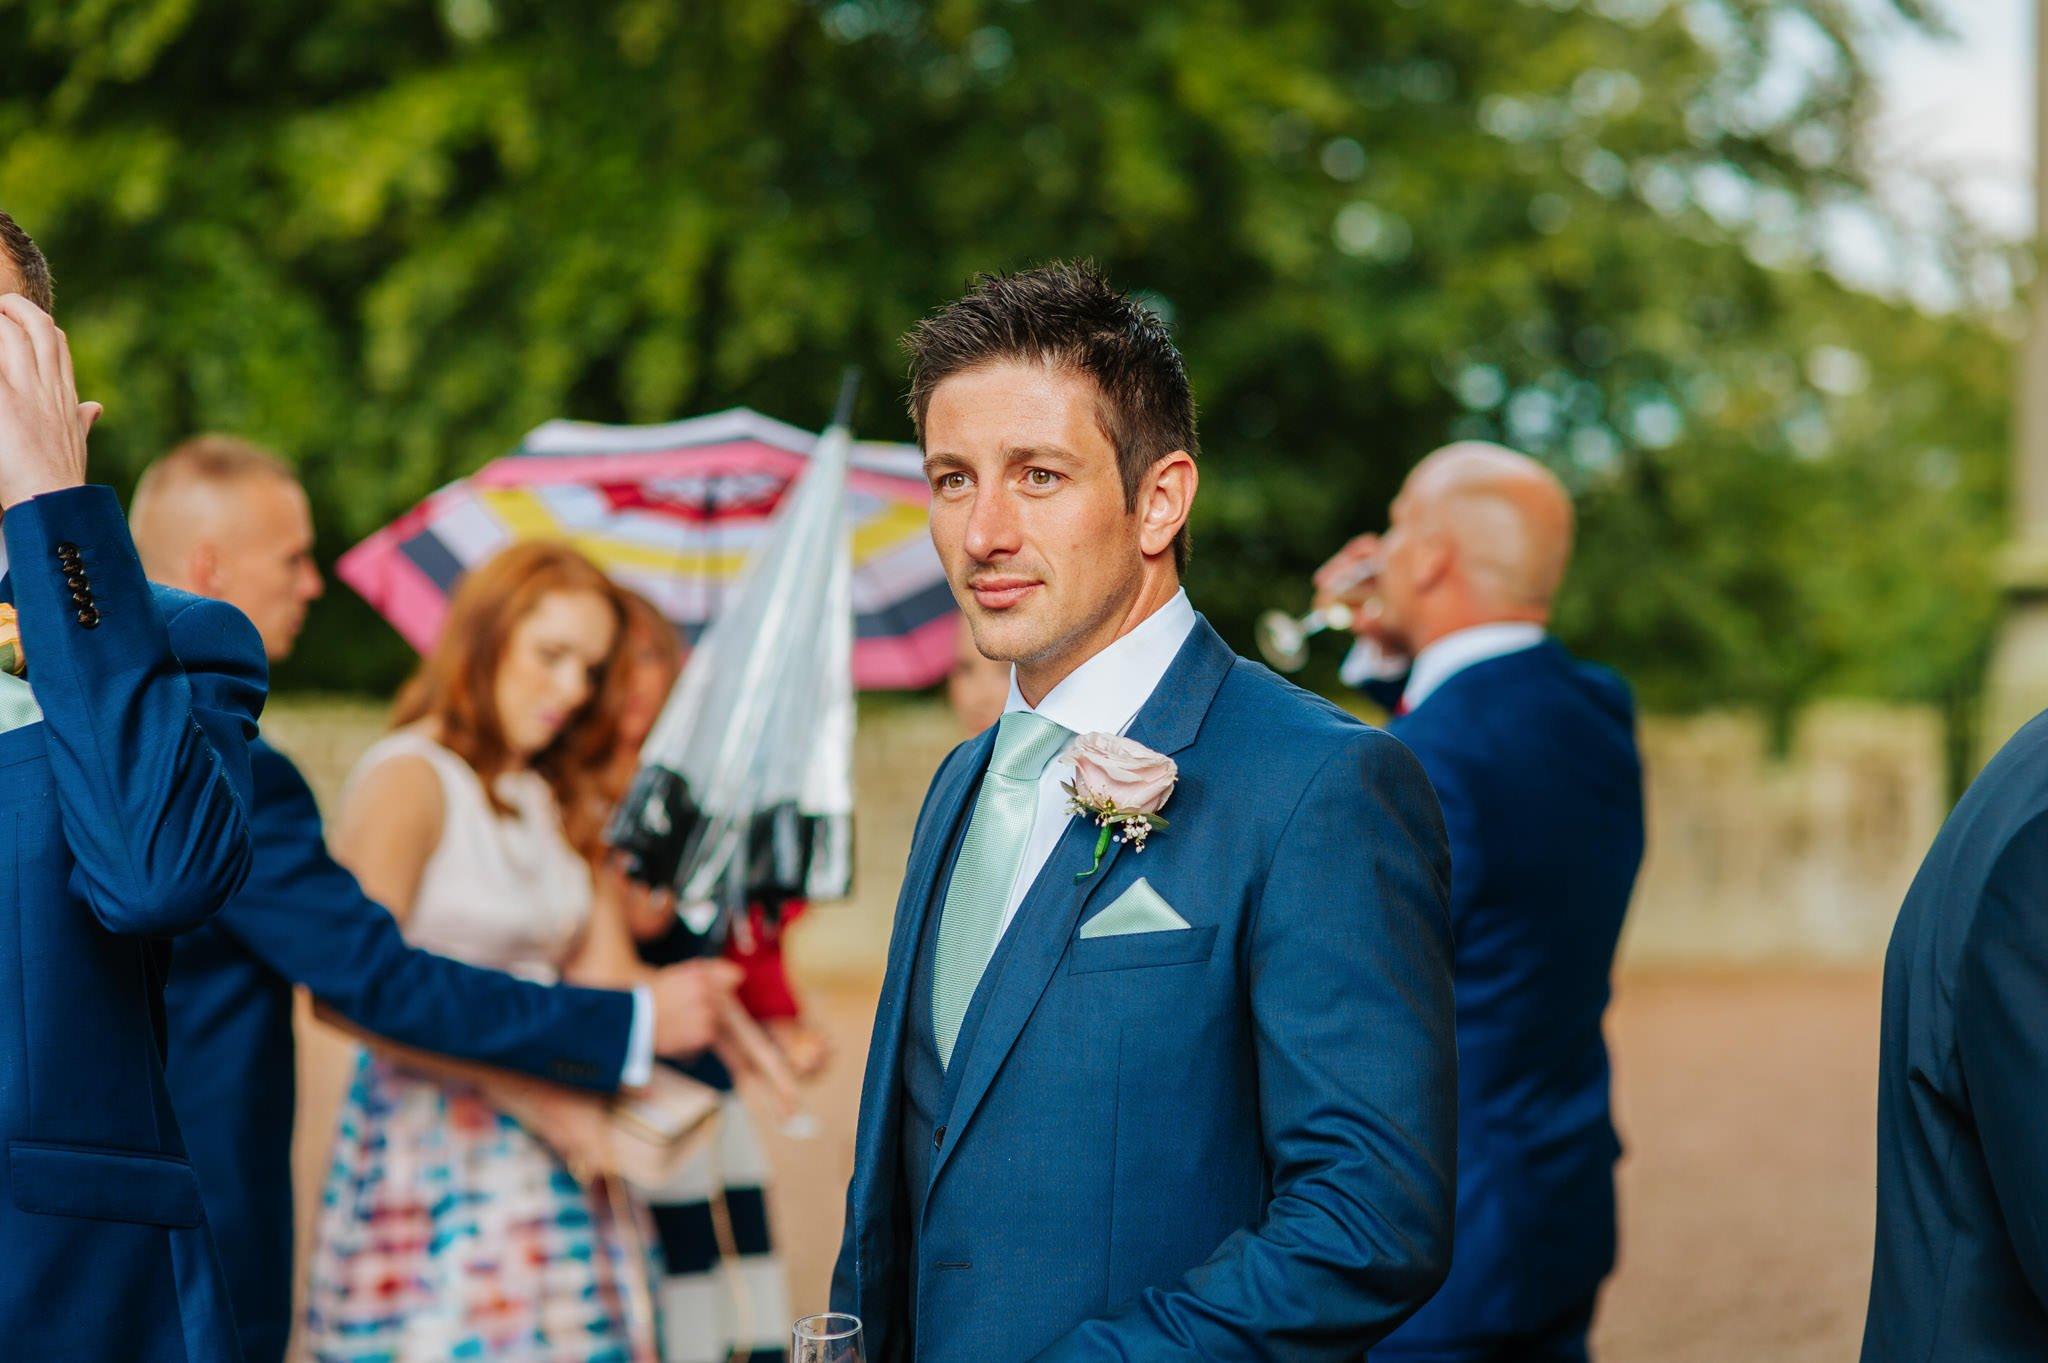 Eastnor Castle wedding photographer Herefordshire, West Midlands - Sarah + Dean 47